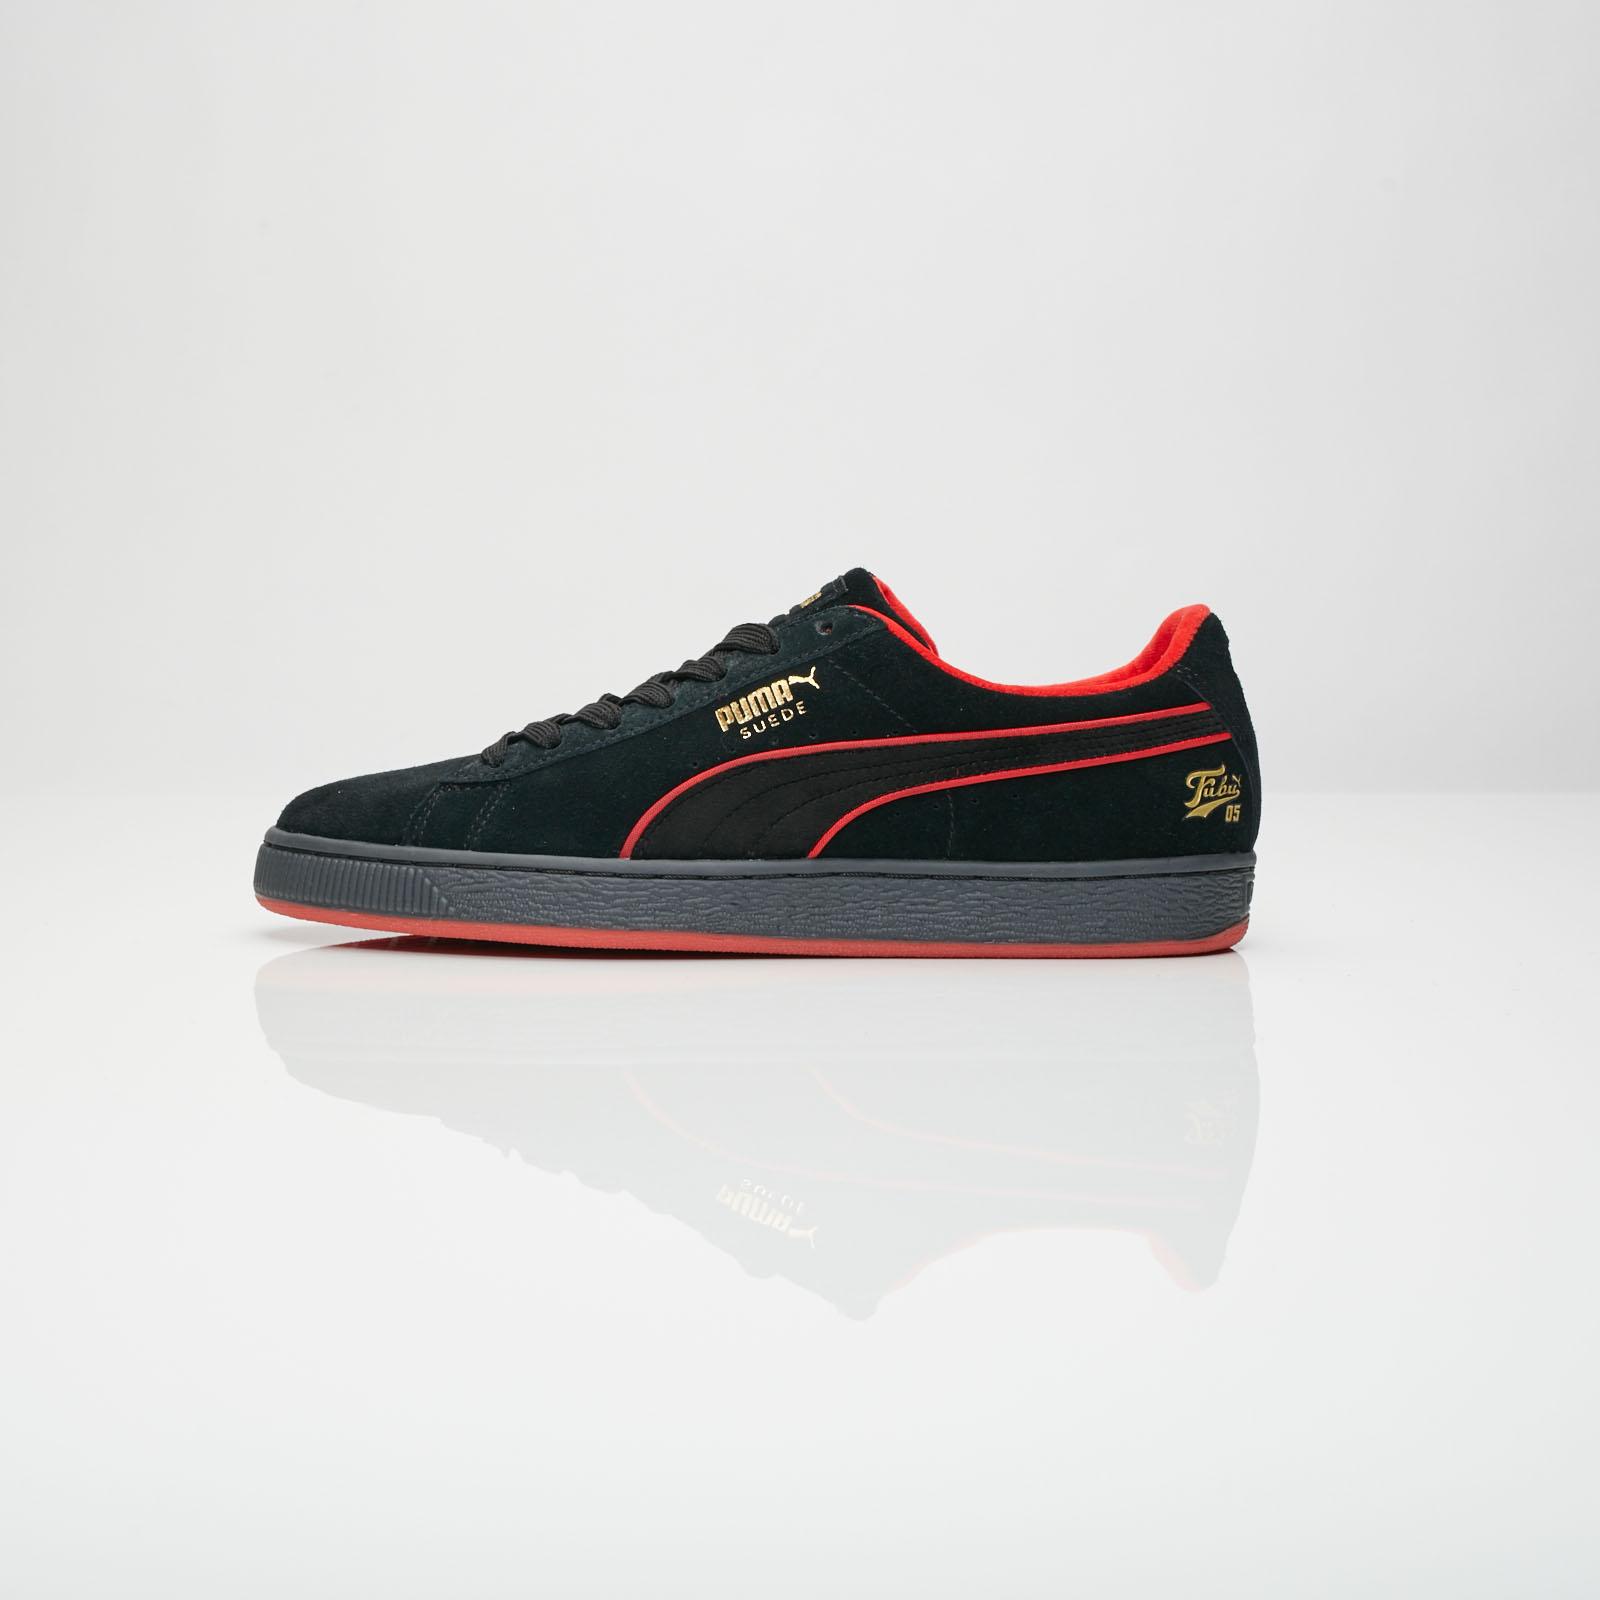 ef3ceee1cb4fd2 Puma Suede Classic X FUBU - 366320-02 - Sneakersnstuff